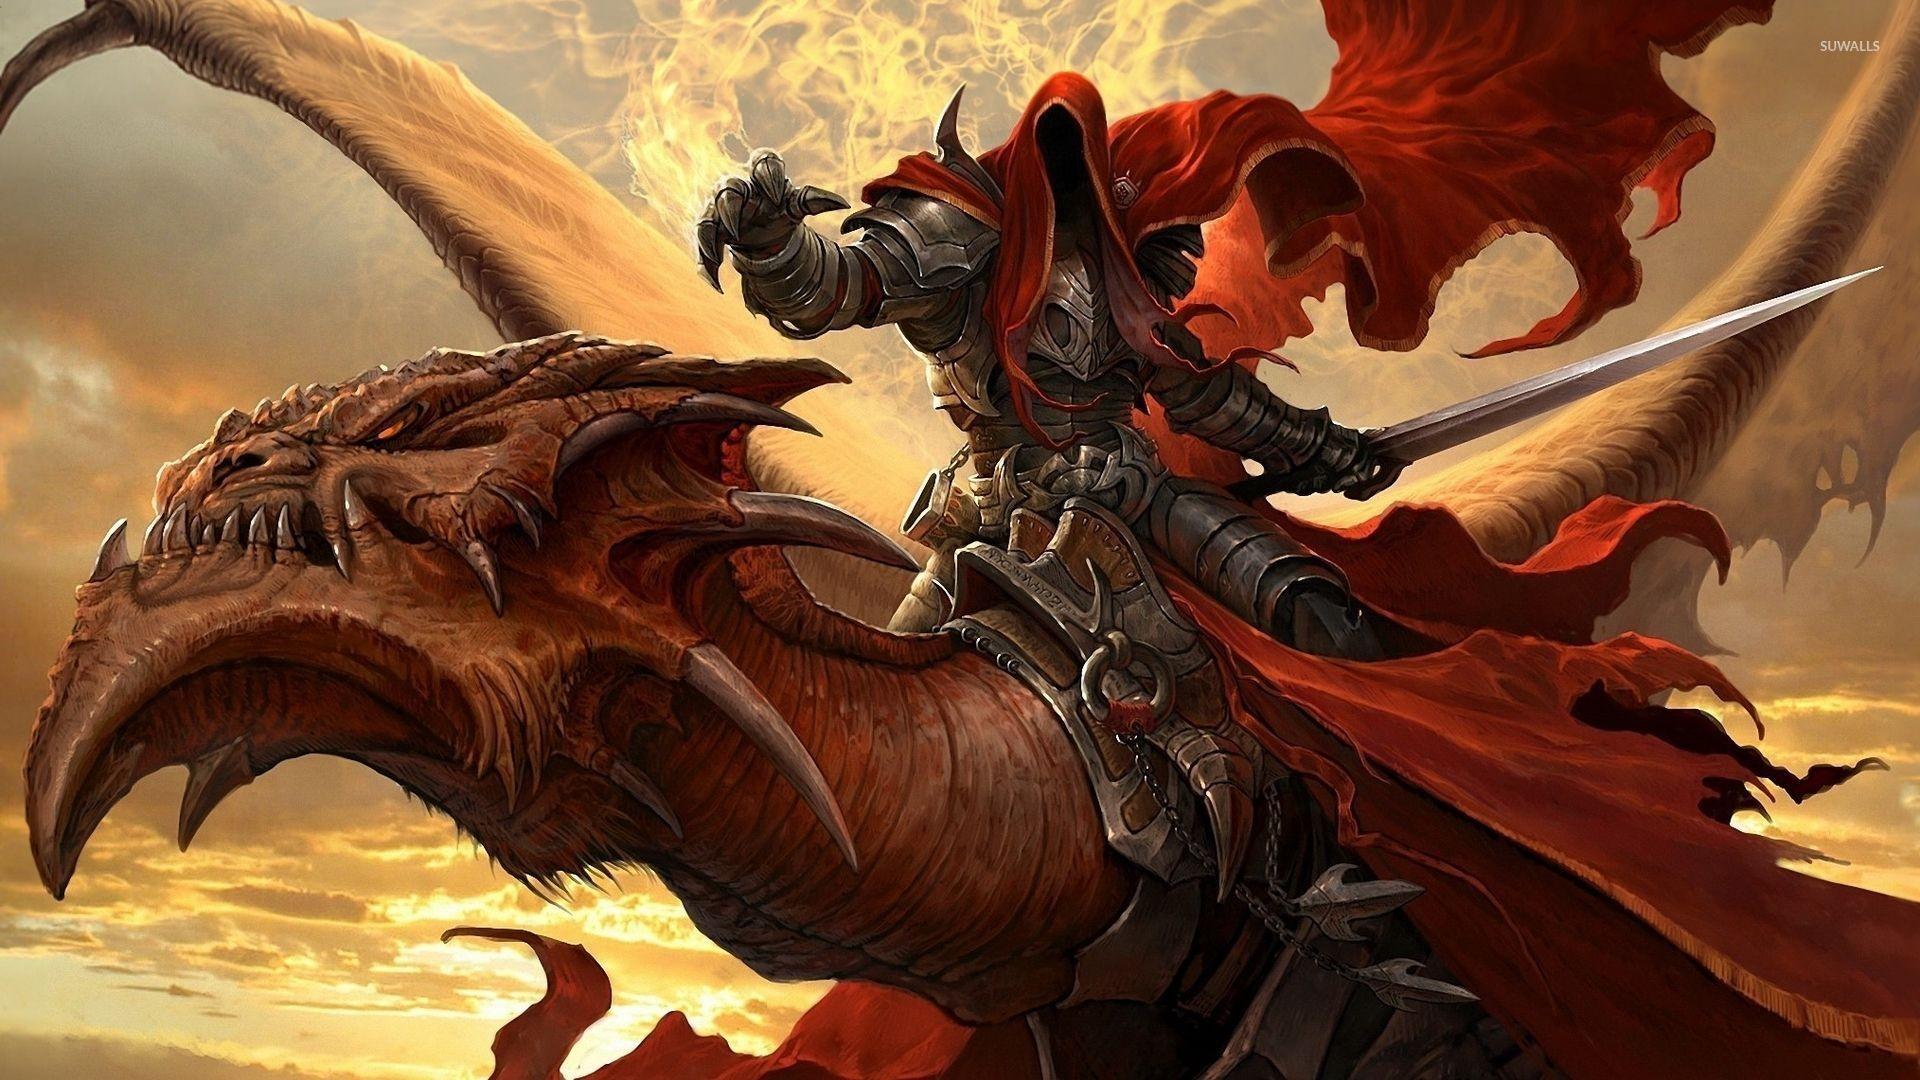 Warrior on the dragon wallpaper jpg